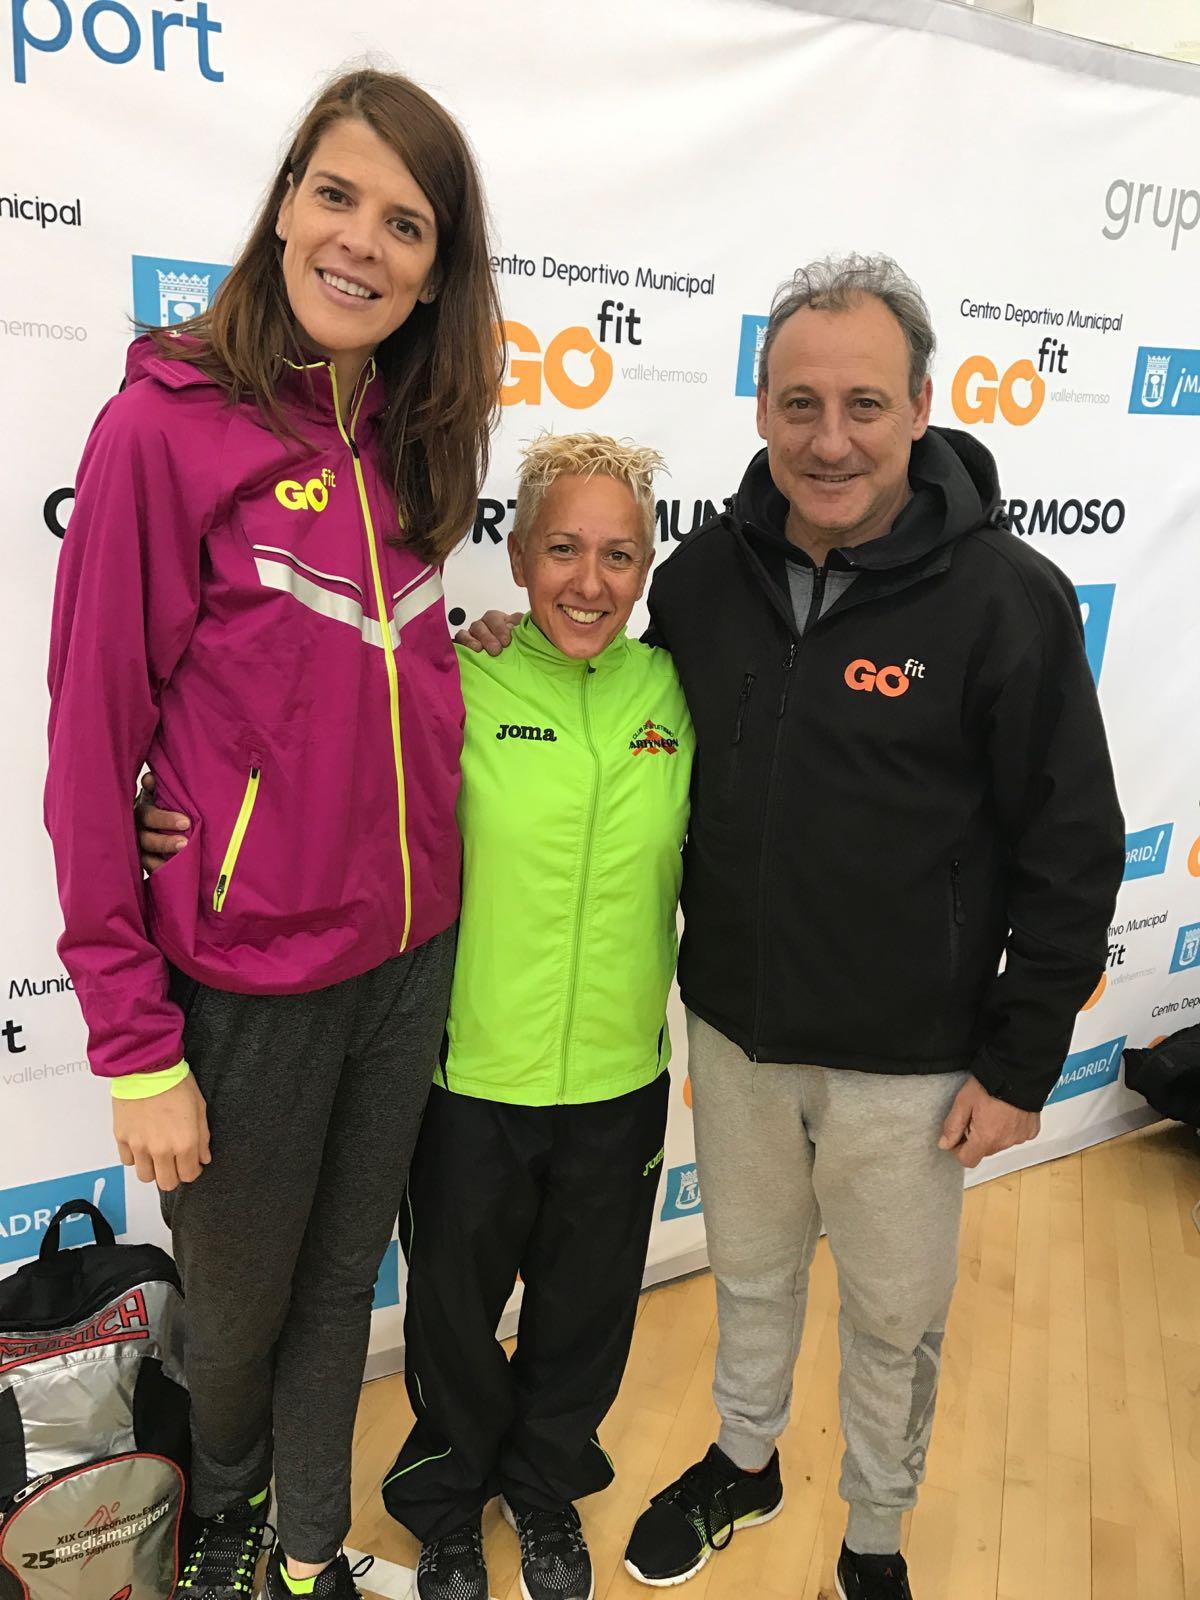 La atleta getafense Nuria Prieto del Club Artyneon se proclama campeona de Madrid de 10 Km en ruta